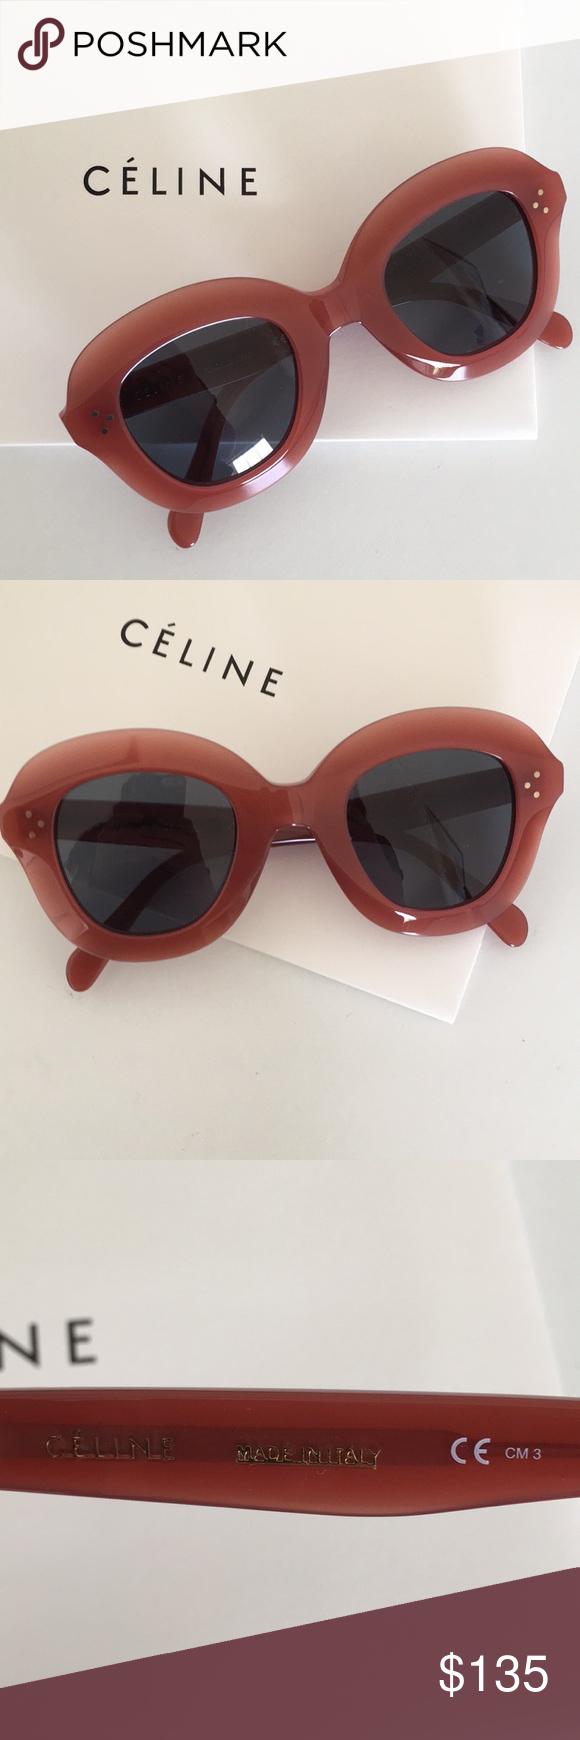 5e1d4971e8c Spotted while shopping on Poshmark  Pink Céline Sunglasses!  poshmark   fashion  shopping  style  Celine  Accessories